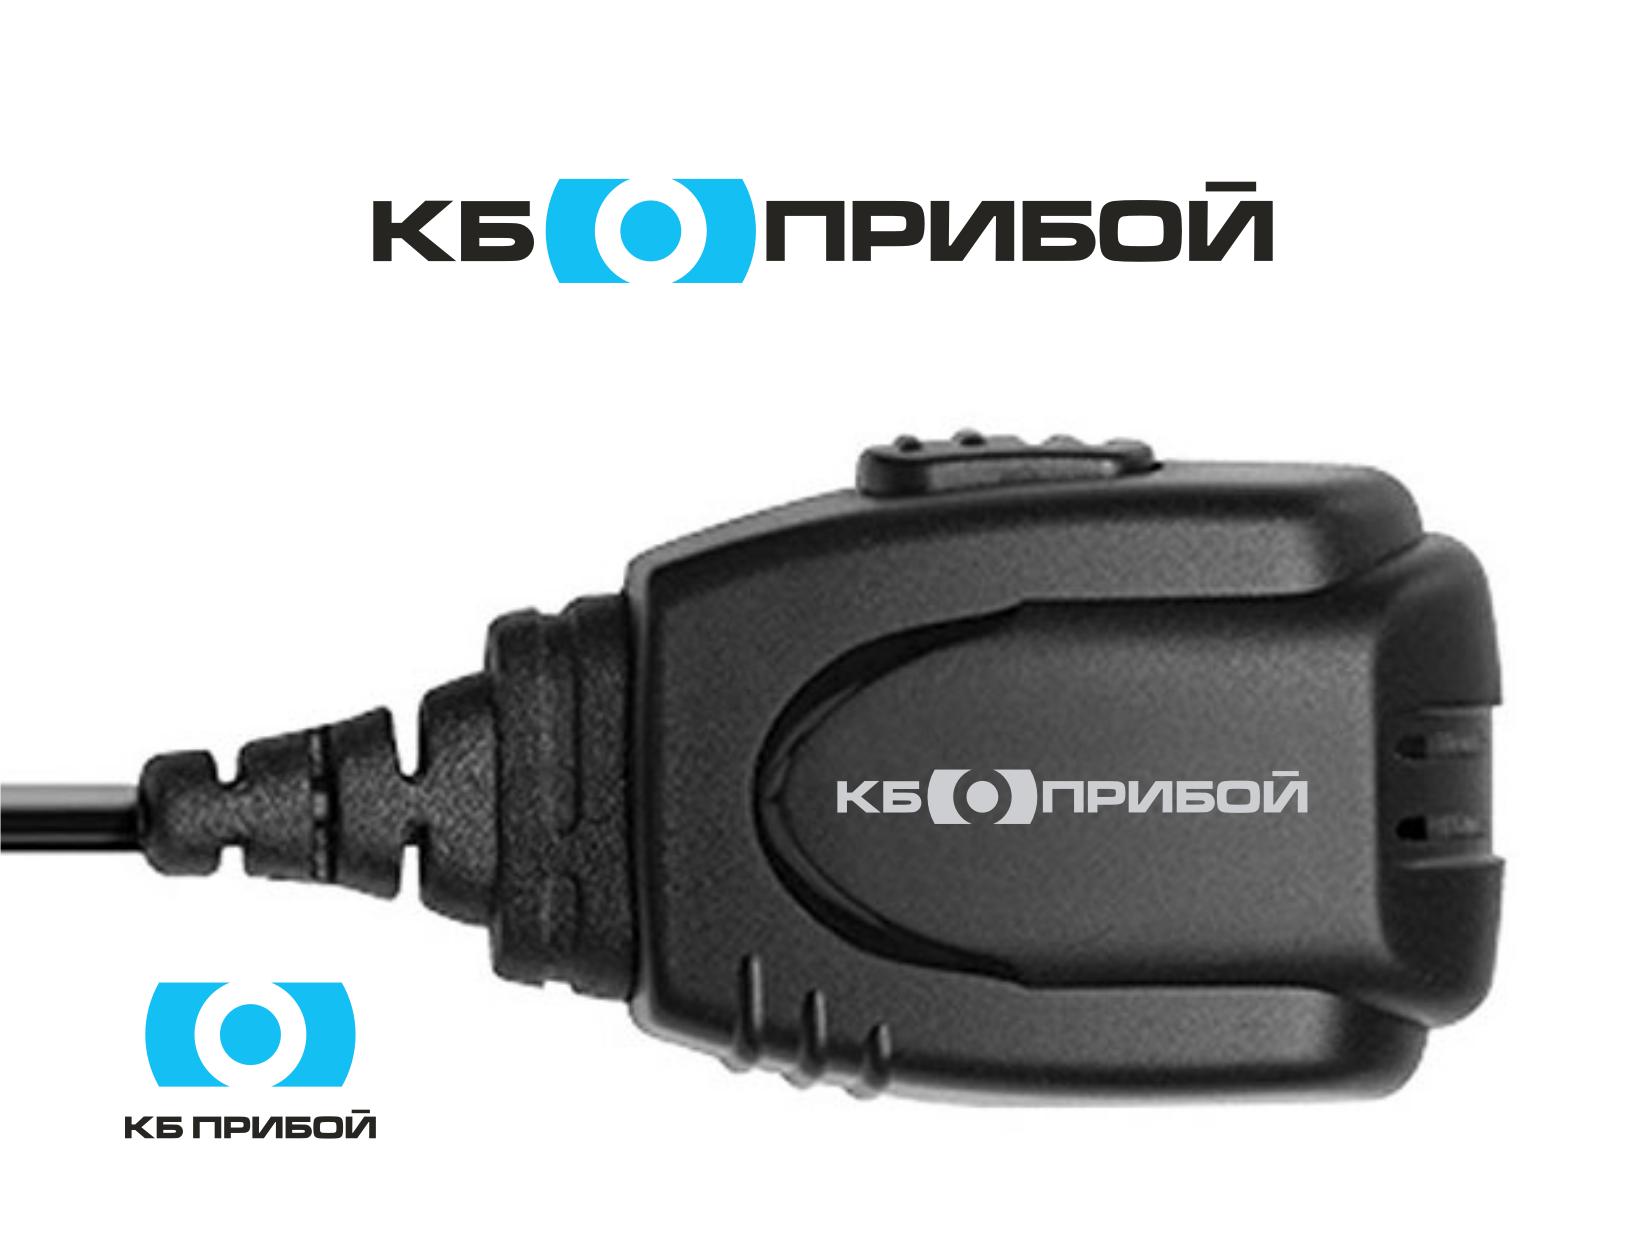 Разработка логотипа и фирменного стиля для КБ Прибой фото f_3135b24b16864dbe.png